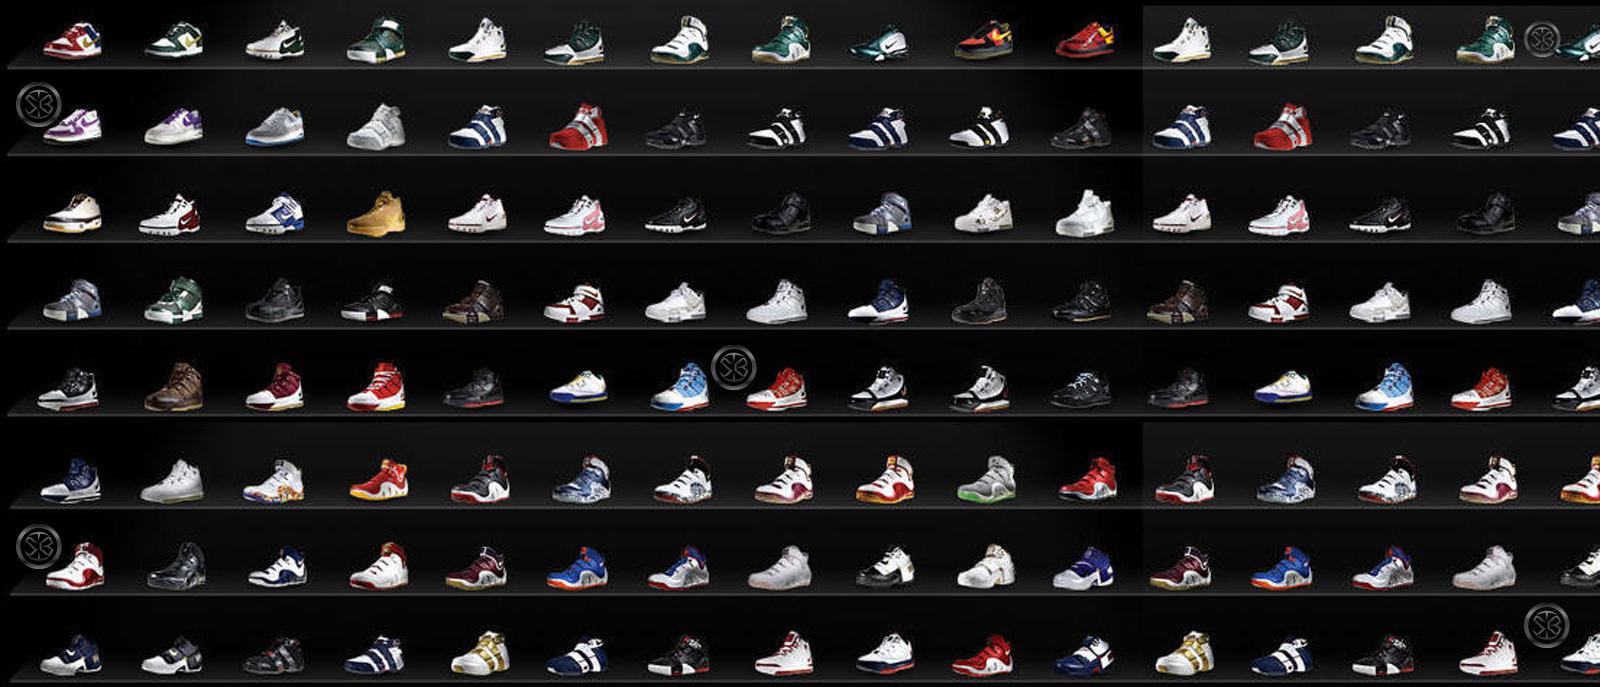 Buy Backgrounds sneakerhead pictures trends